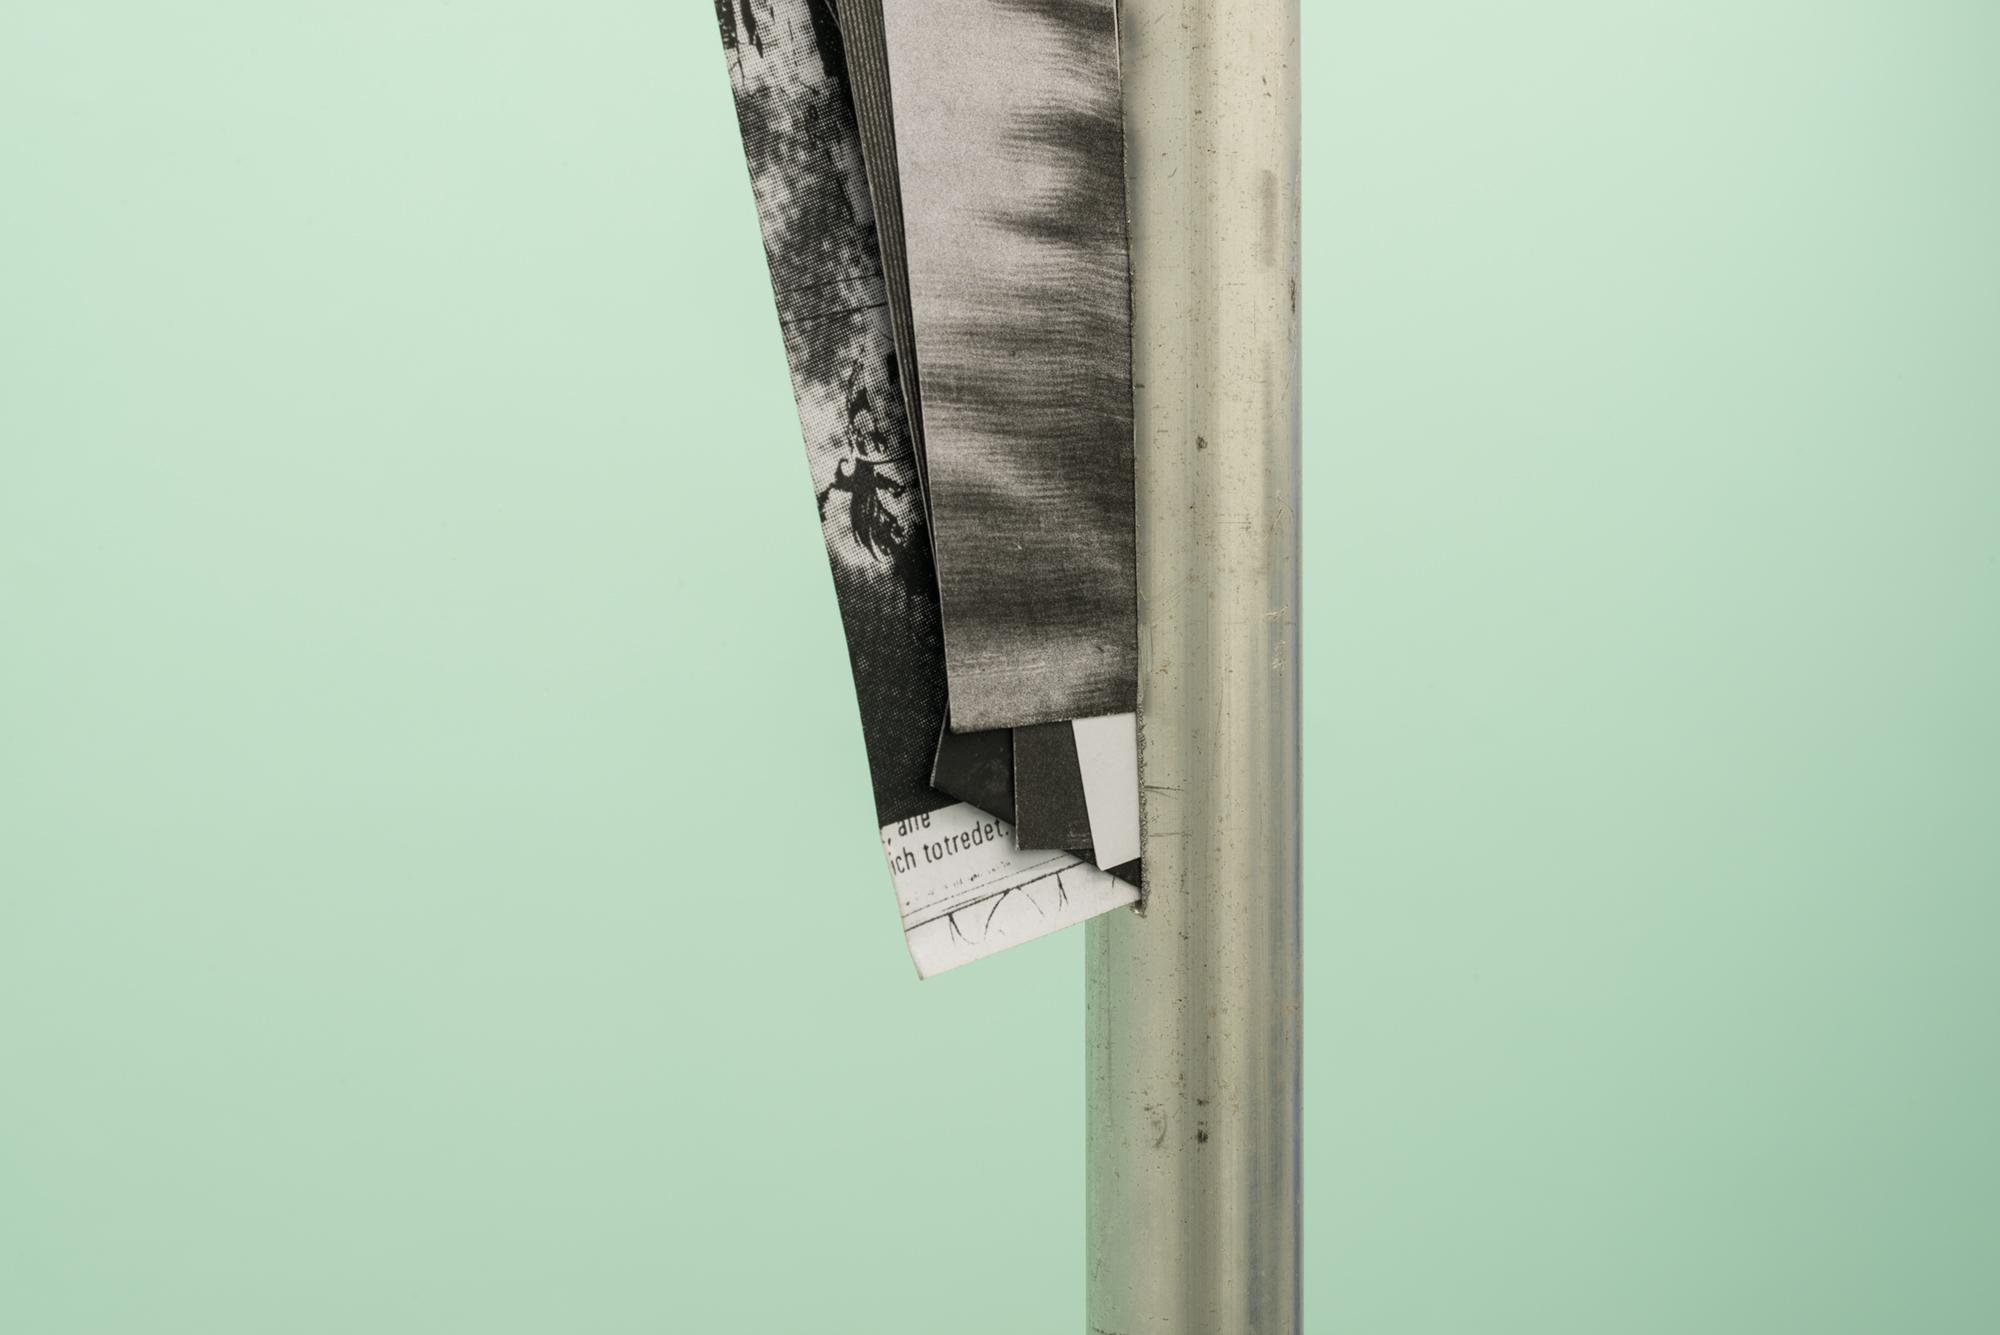 6. Manor Grunewald untitled alluminium & photocopy